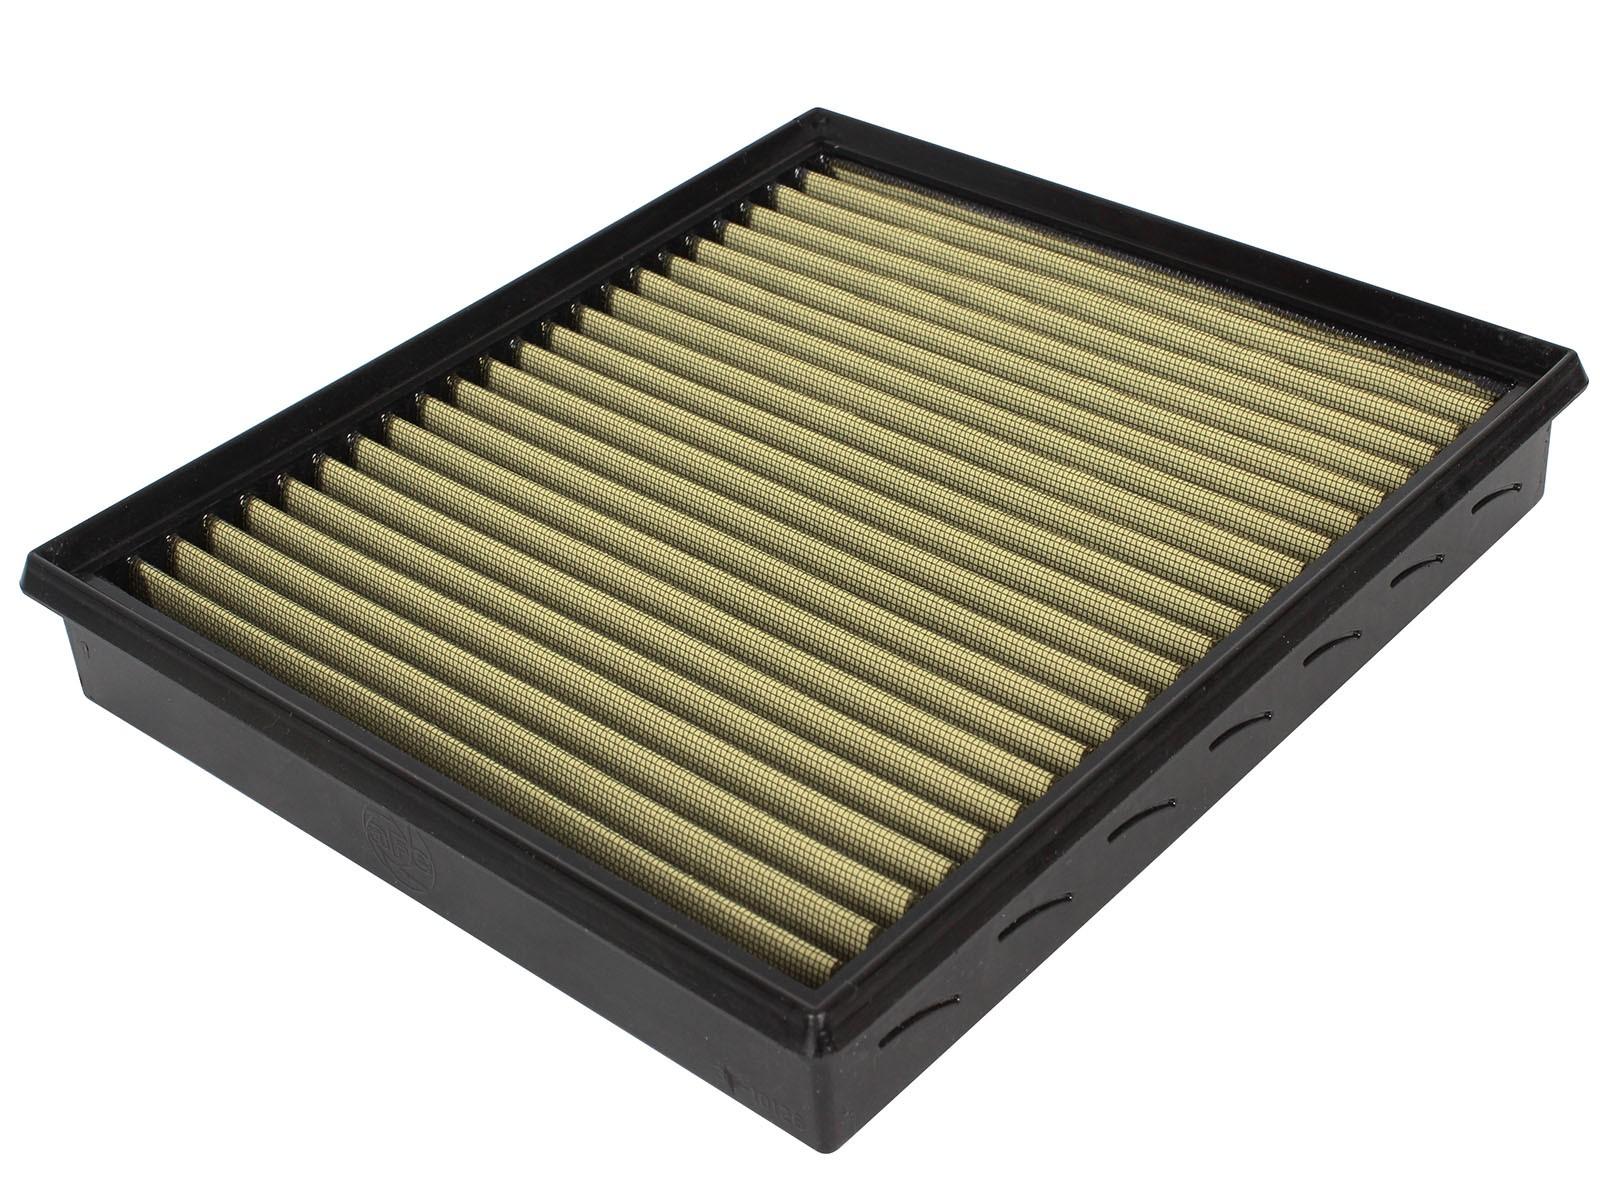 aFe POWER 73-10126 Magnum FLOW Pro GUARD7 Air Filter